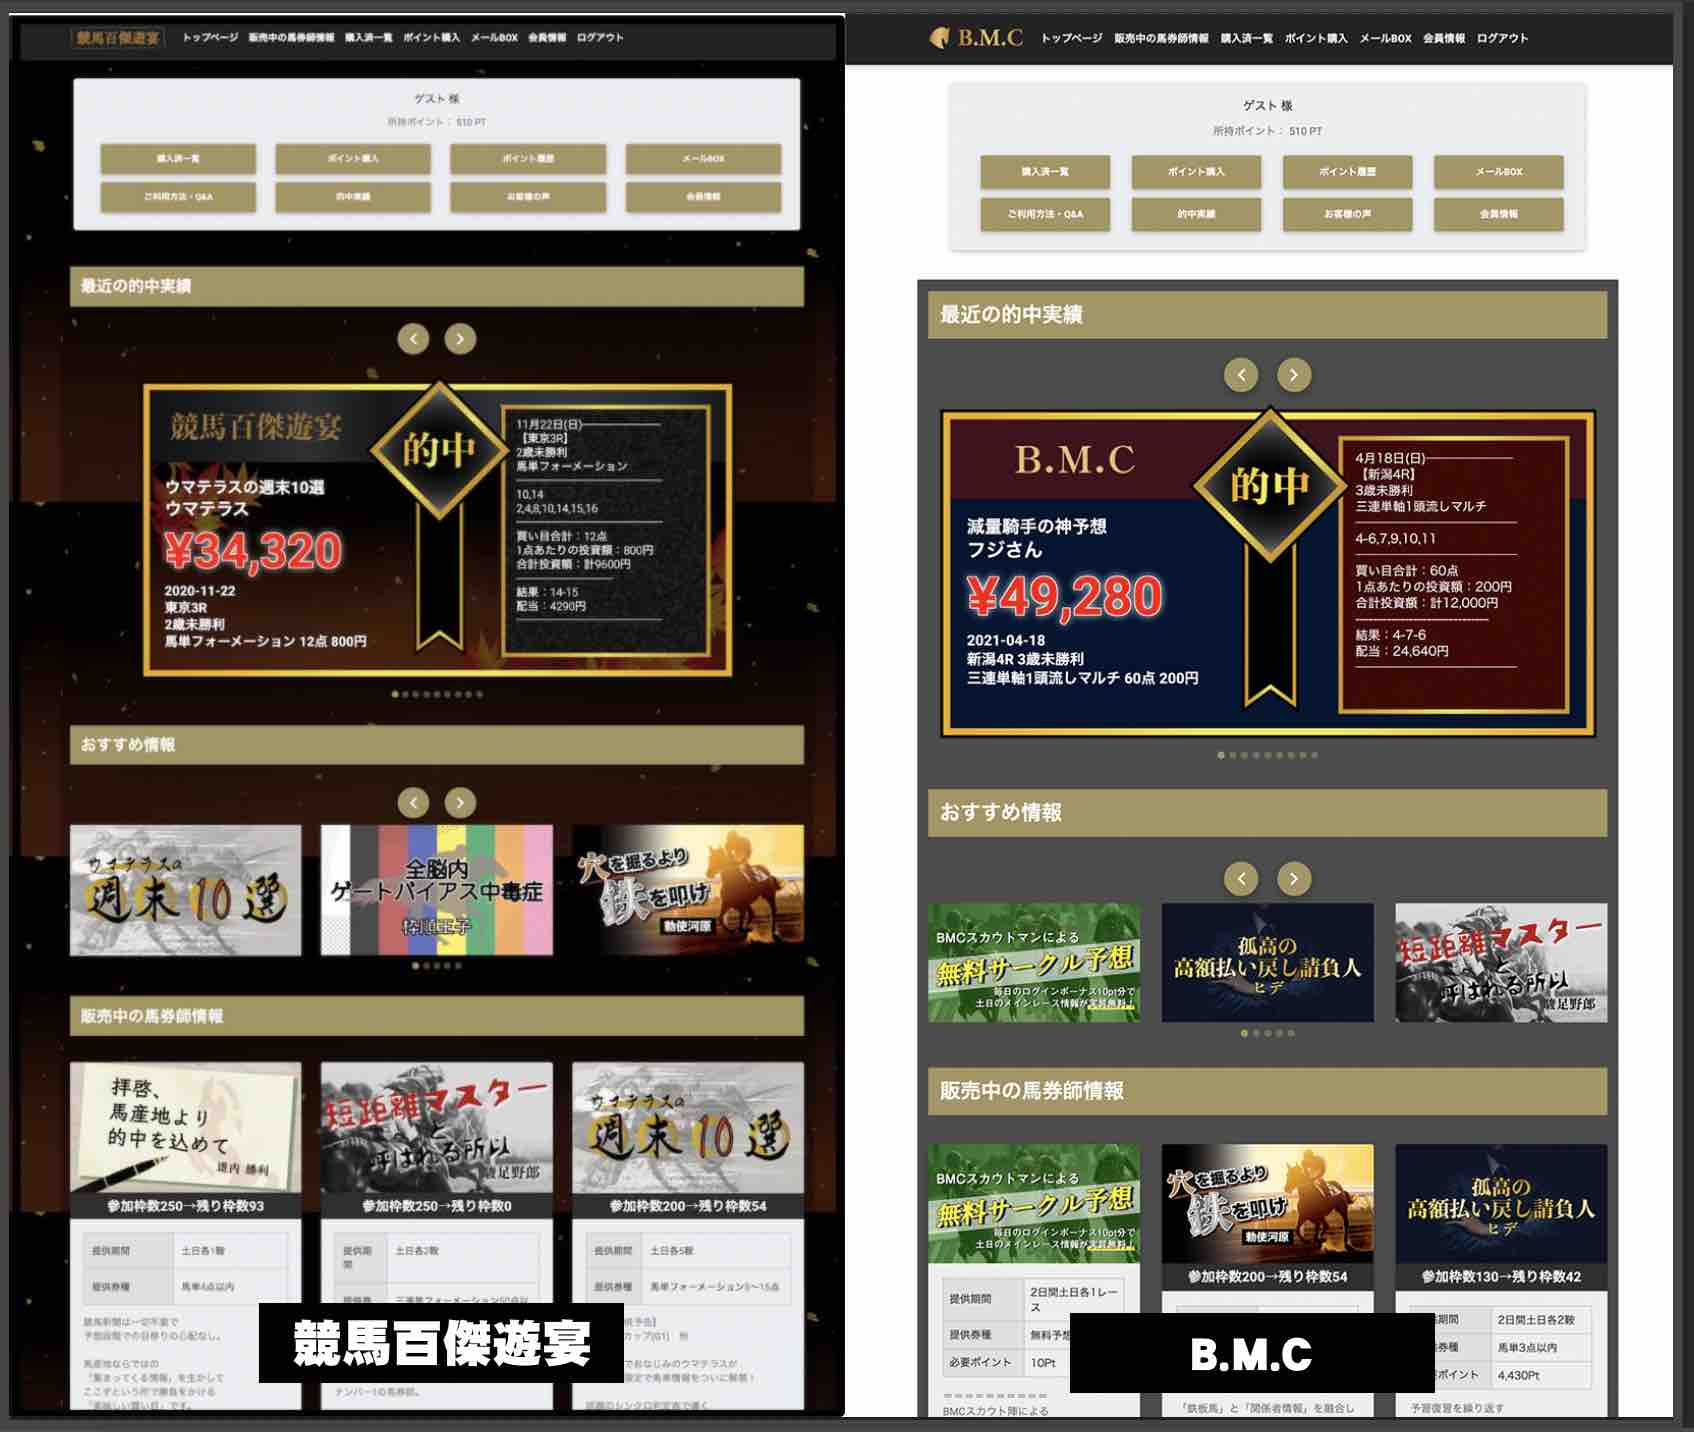 BMC(B.M.C)馬券師サークルの会員ページ